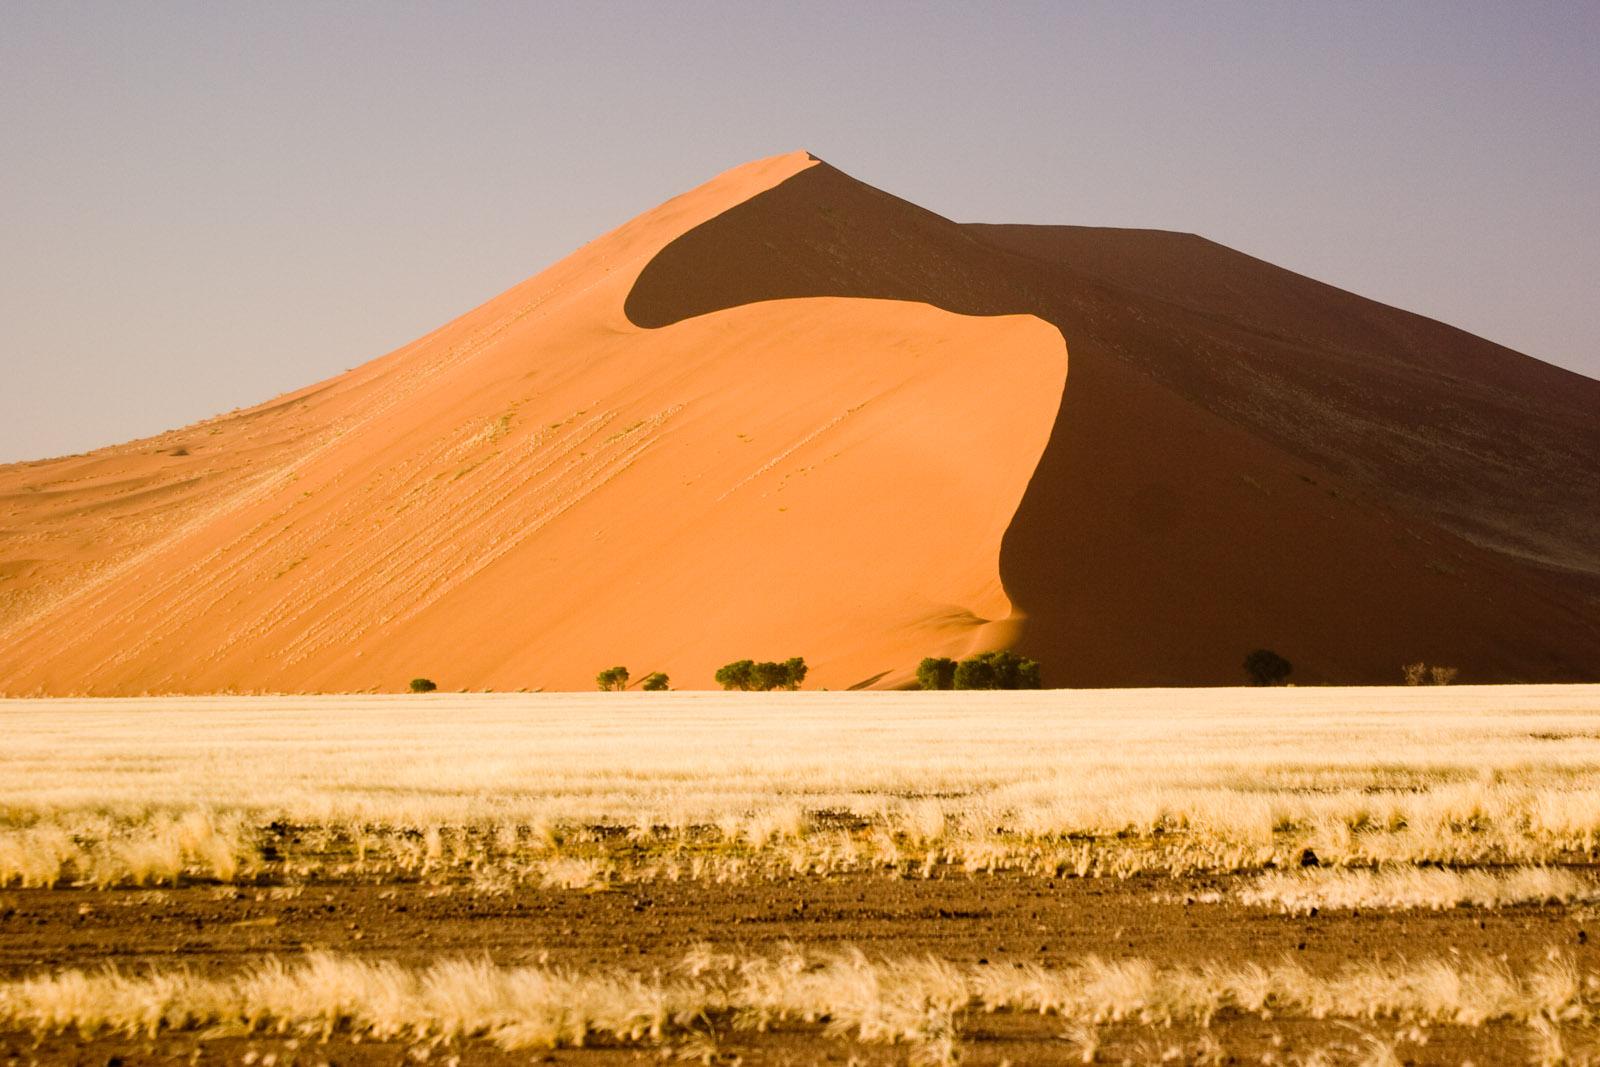 Sahara clipart desert mountain #1